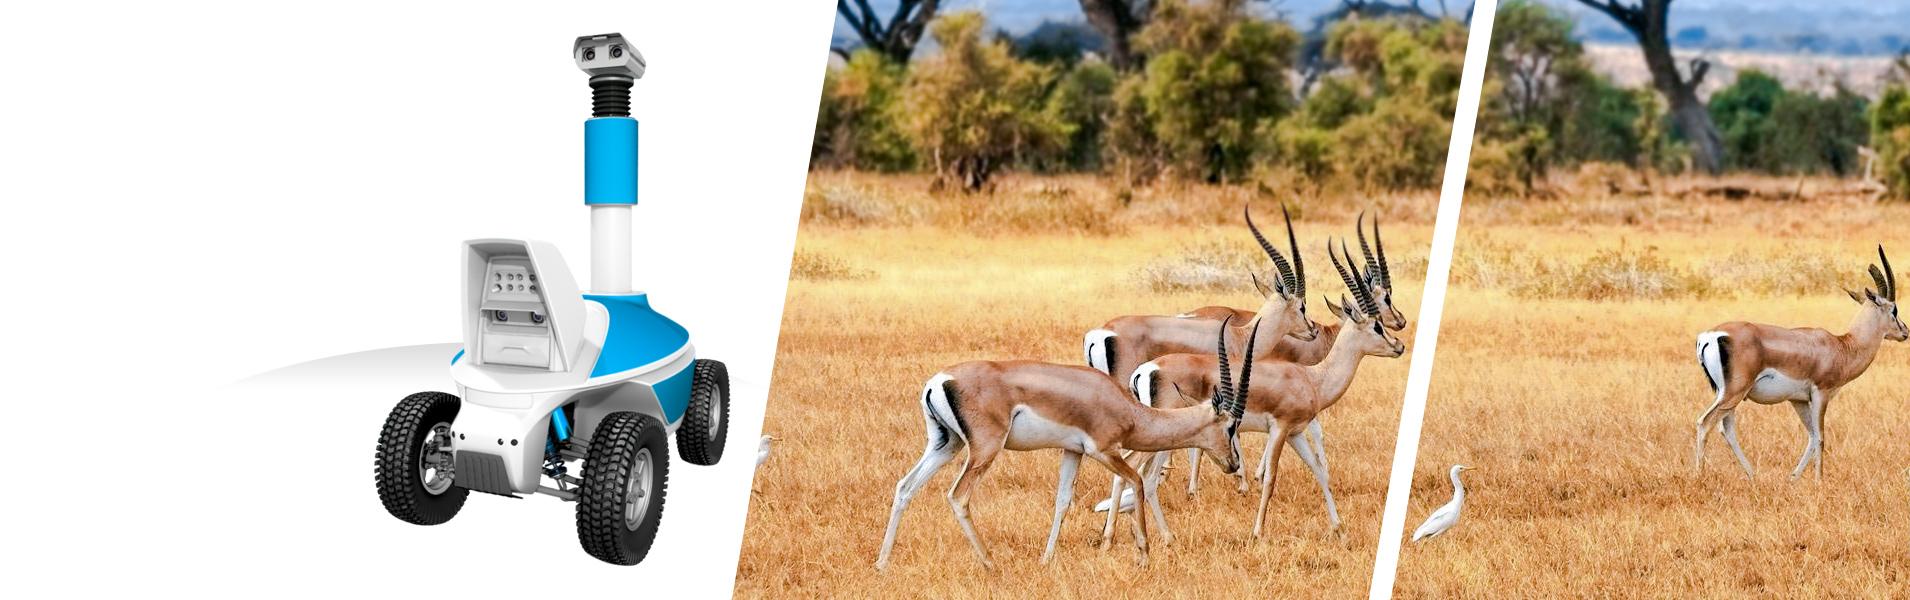 Outdoor telepresence Robot for virtual tourism